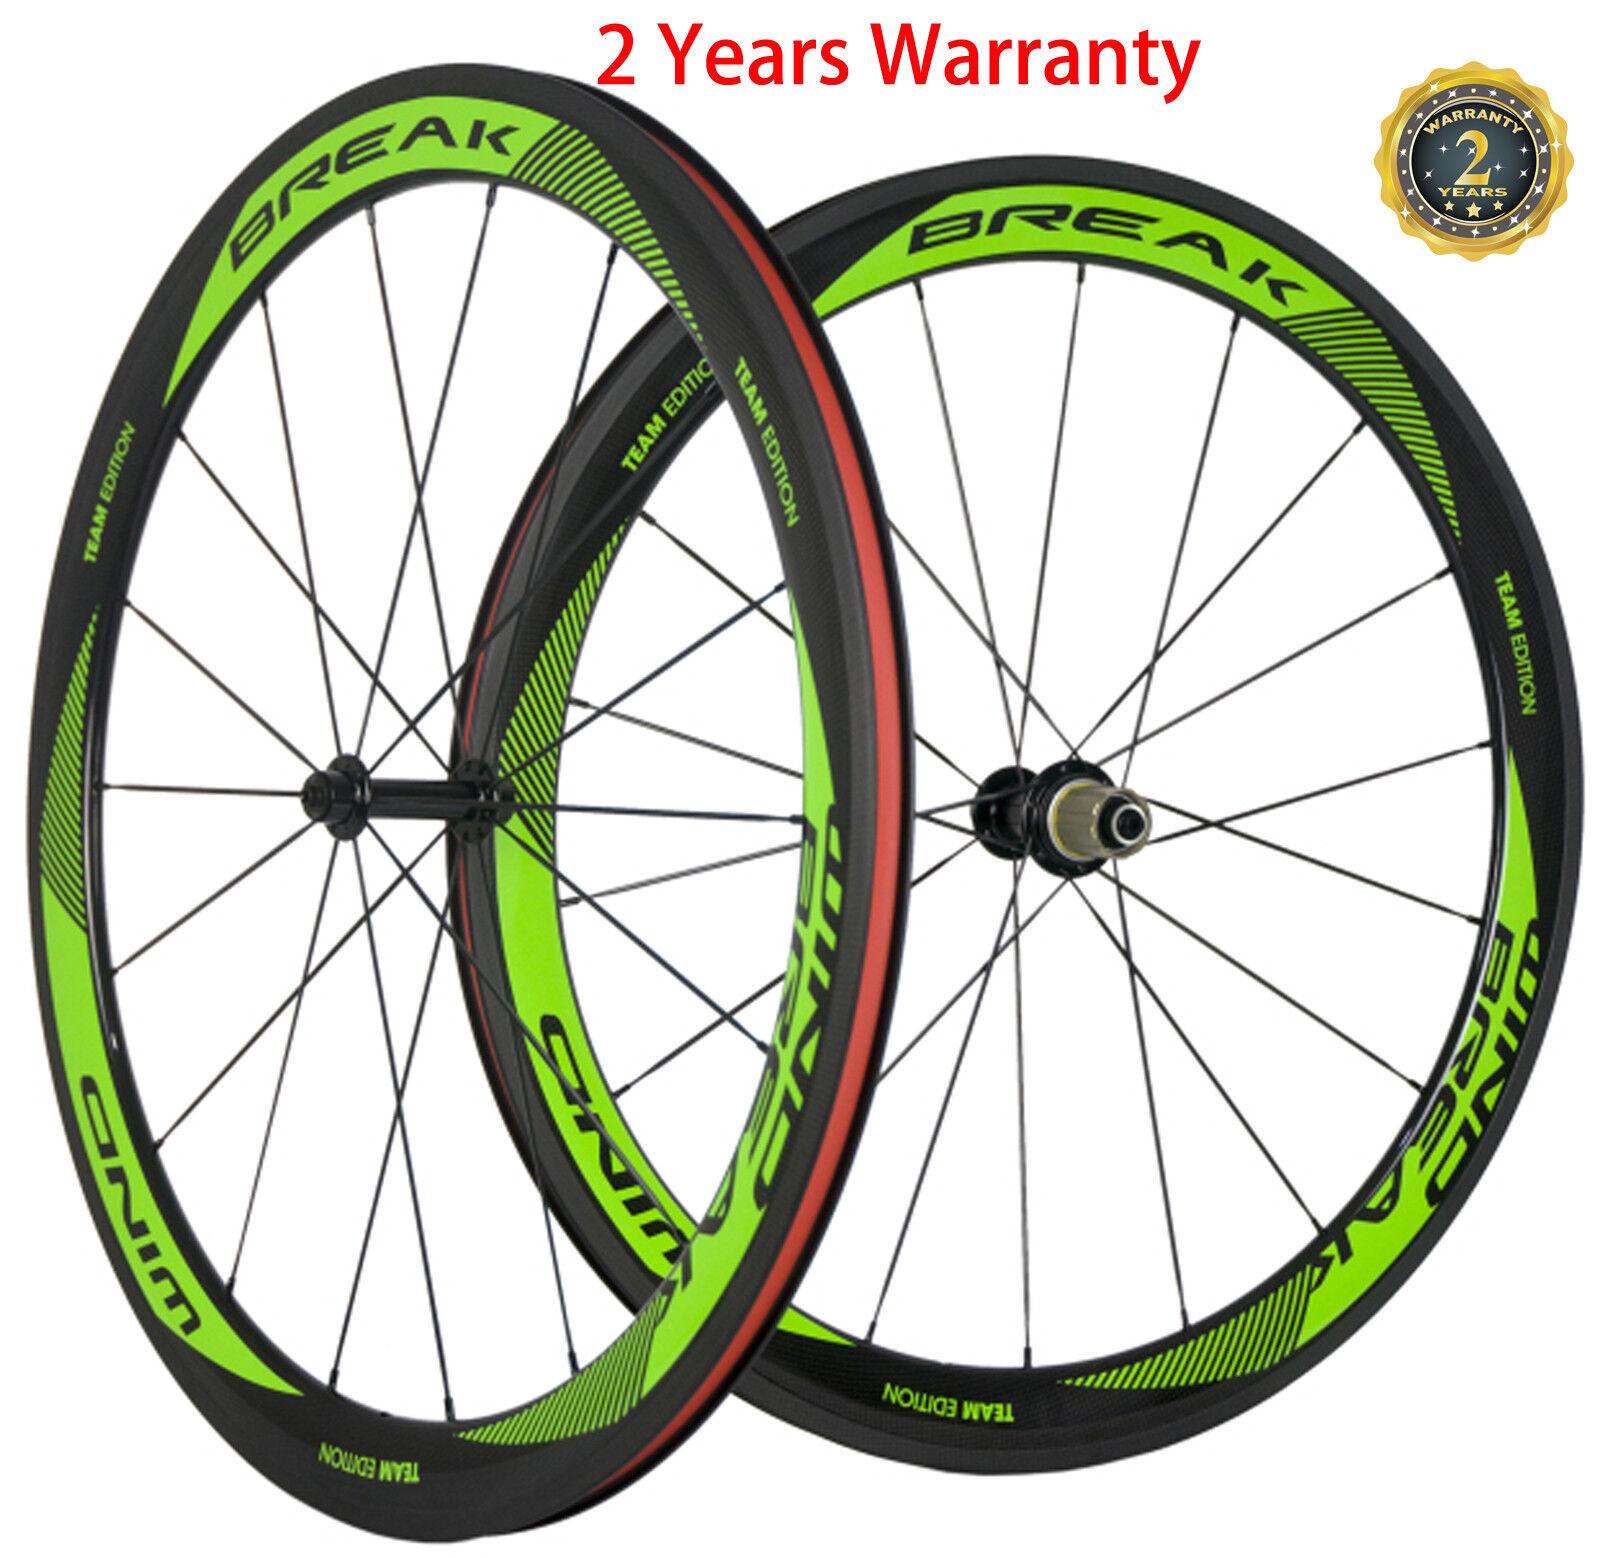 50mm Bike Wheelset Carbon Clincher Wheels Road Bike  R13 Hub Shimano Campagnolo  save up to 50%